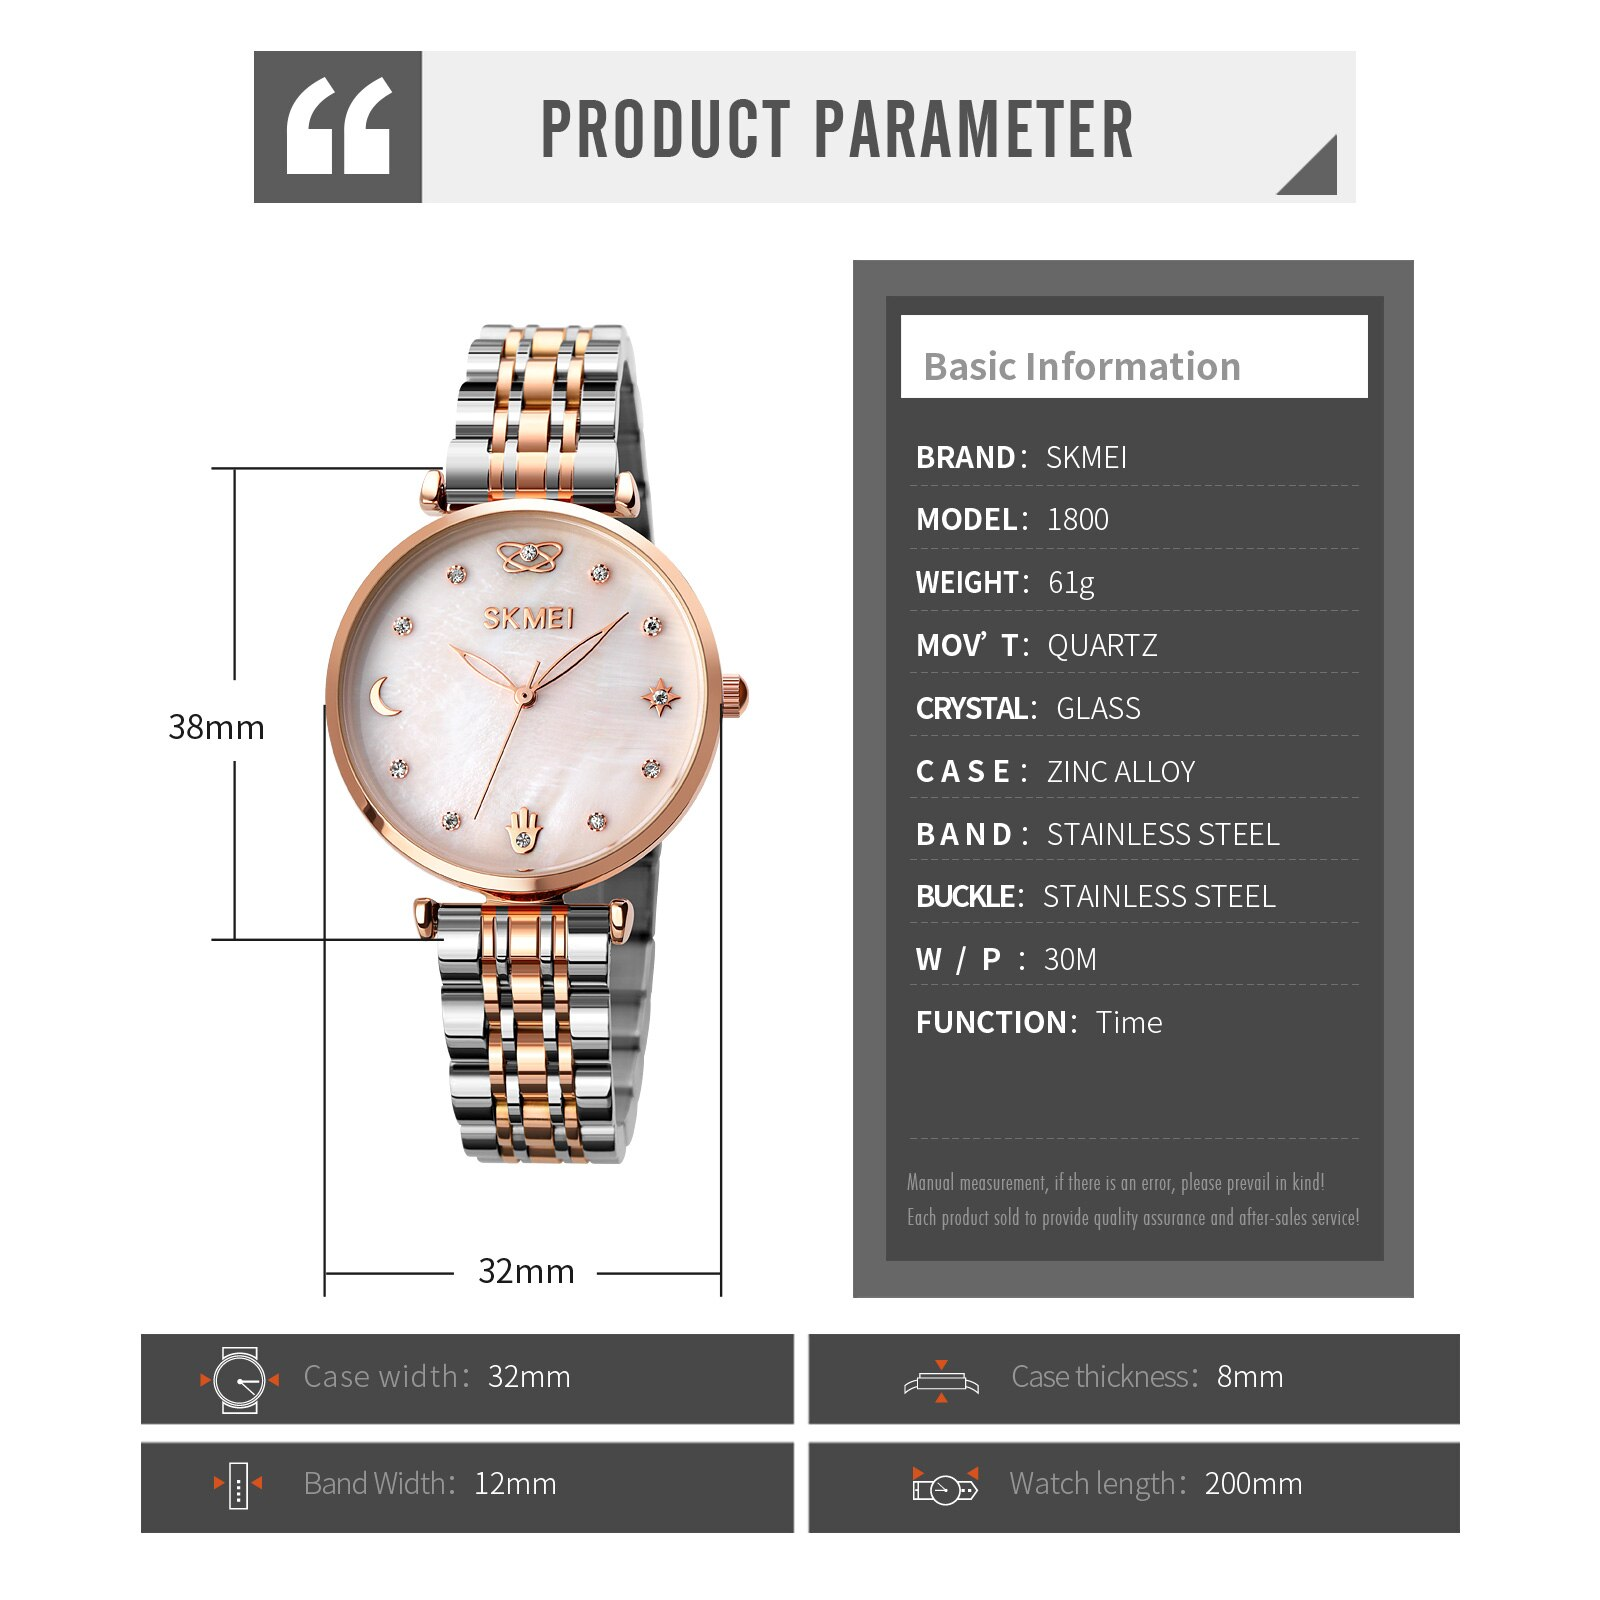 SKMEI Elegant Meticulous Womens Watches Rhinestone Mosaic Fashion Women Quartz Wristwatches Ladies Girls Watch reloj mujer 1800 enlarge